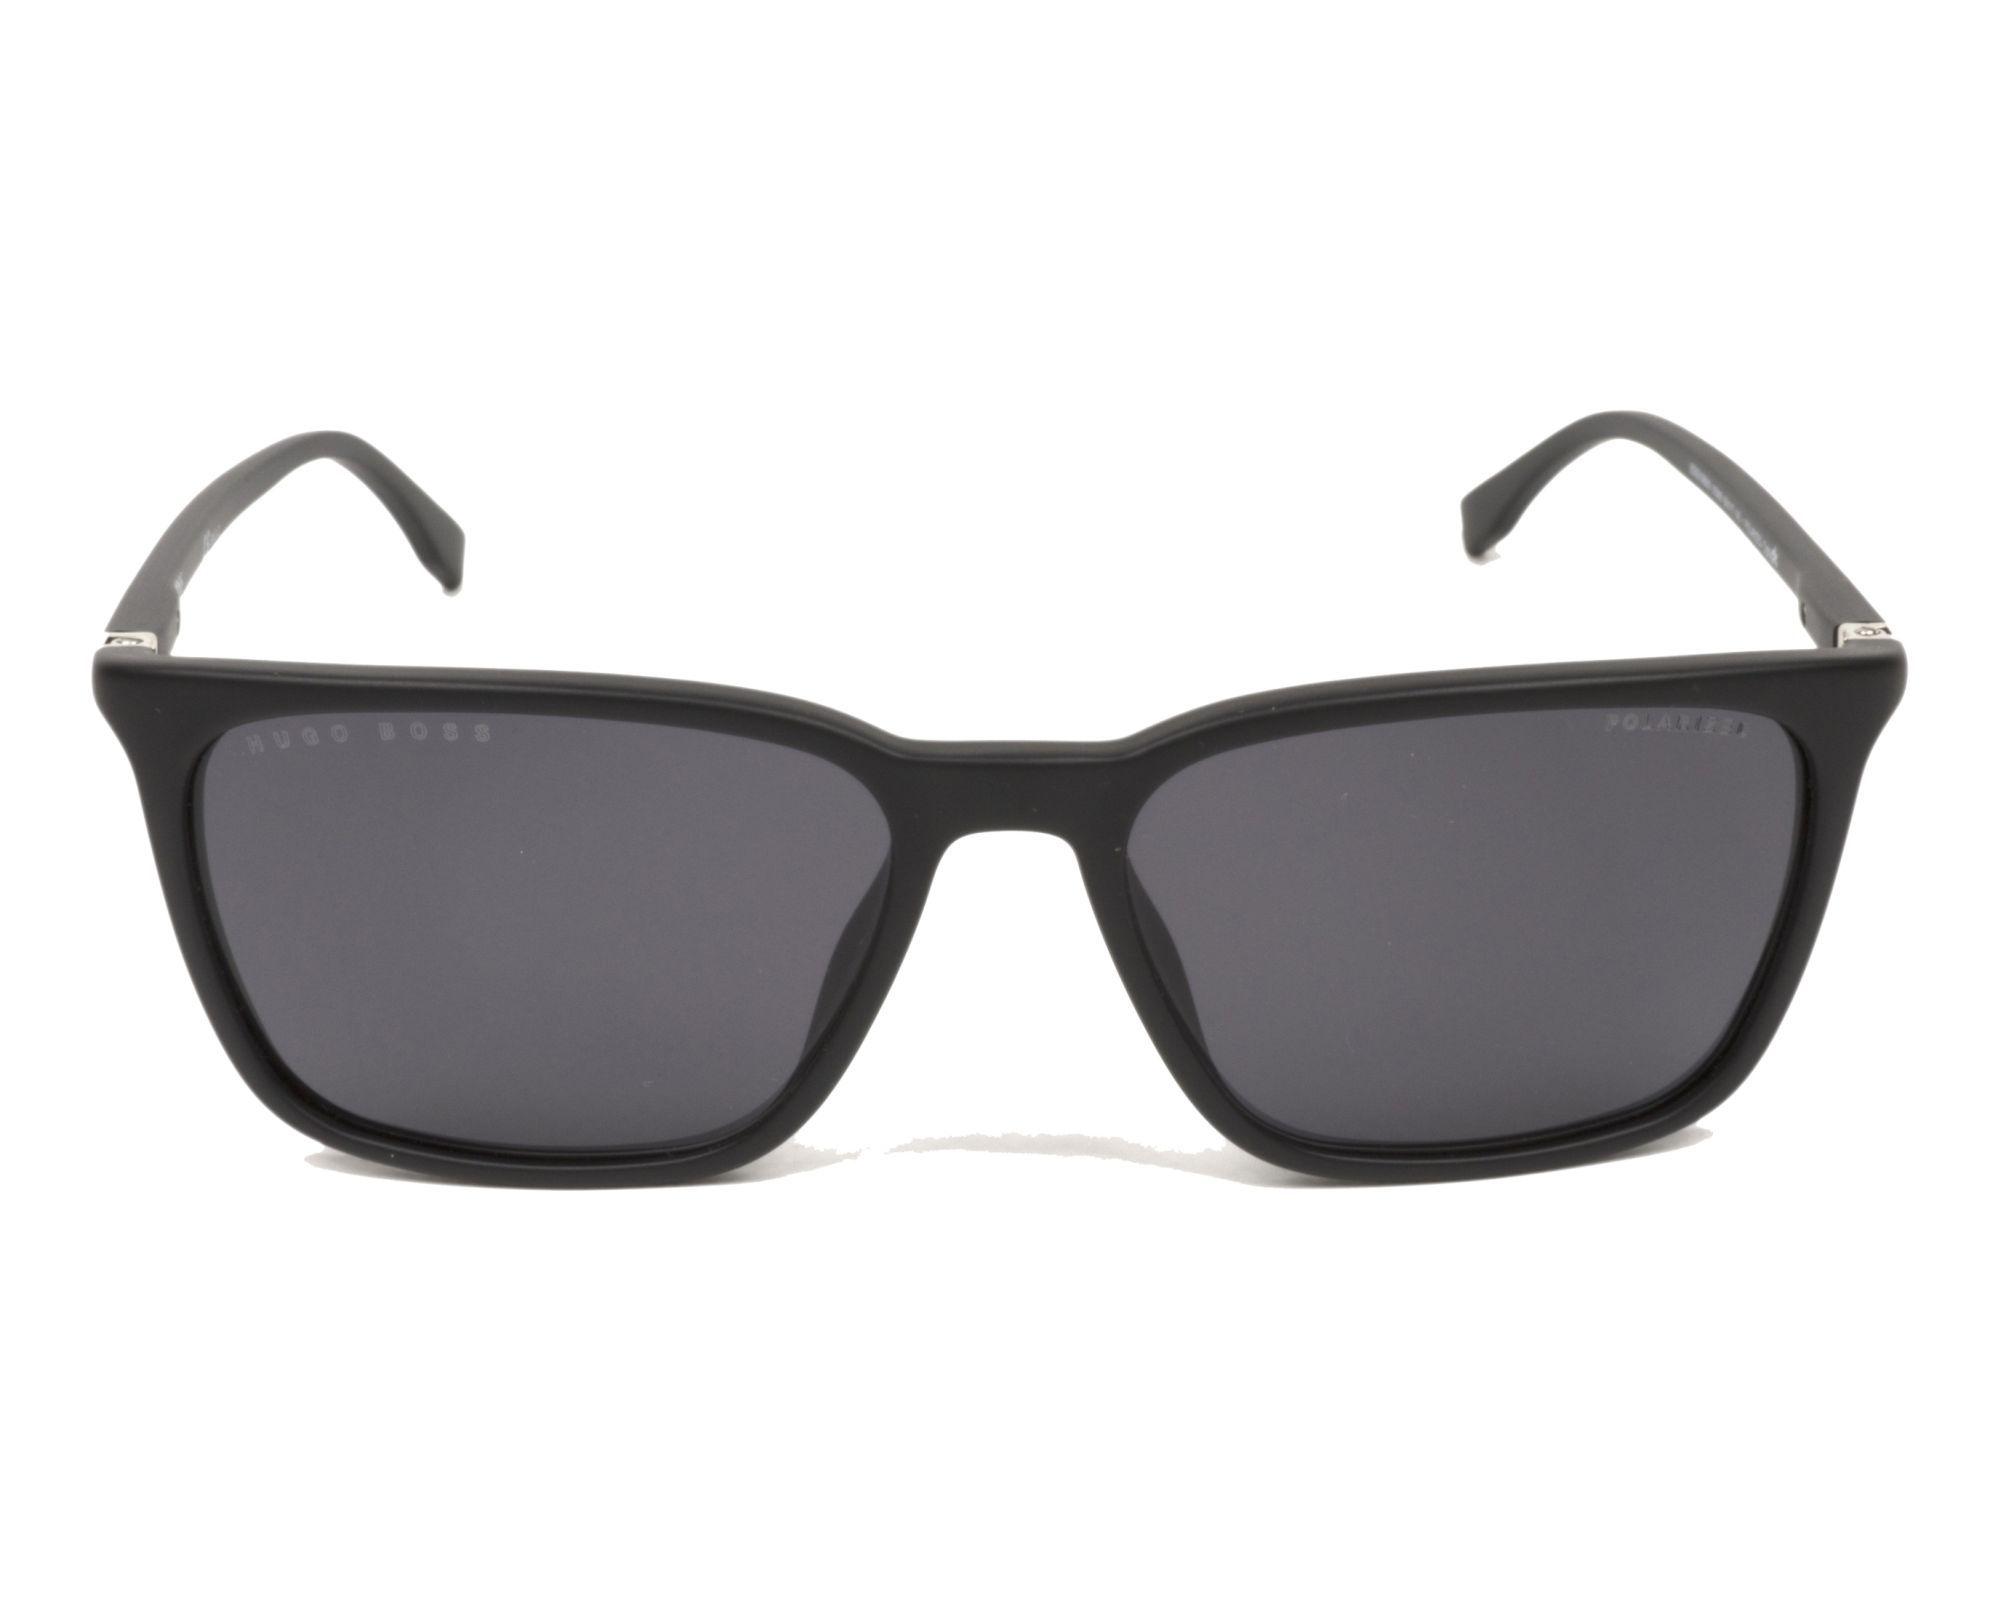 Óculos de Sol Hugo Boss Masculino 0959 S 003M9 - Omega Ótica e ... 2525de9013